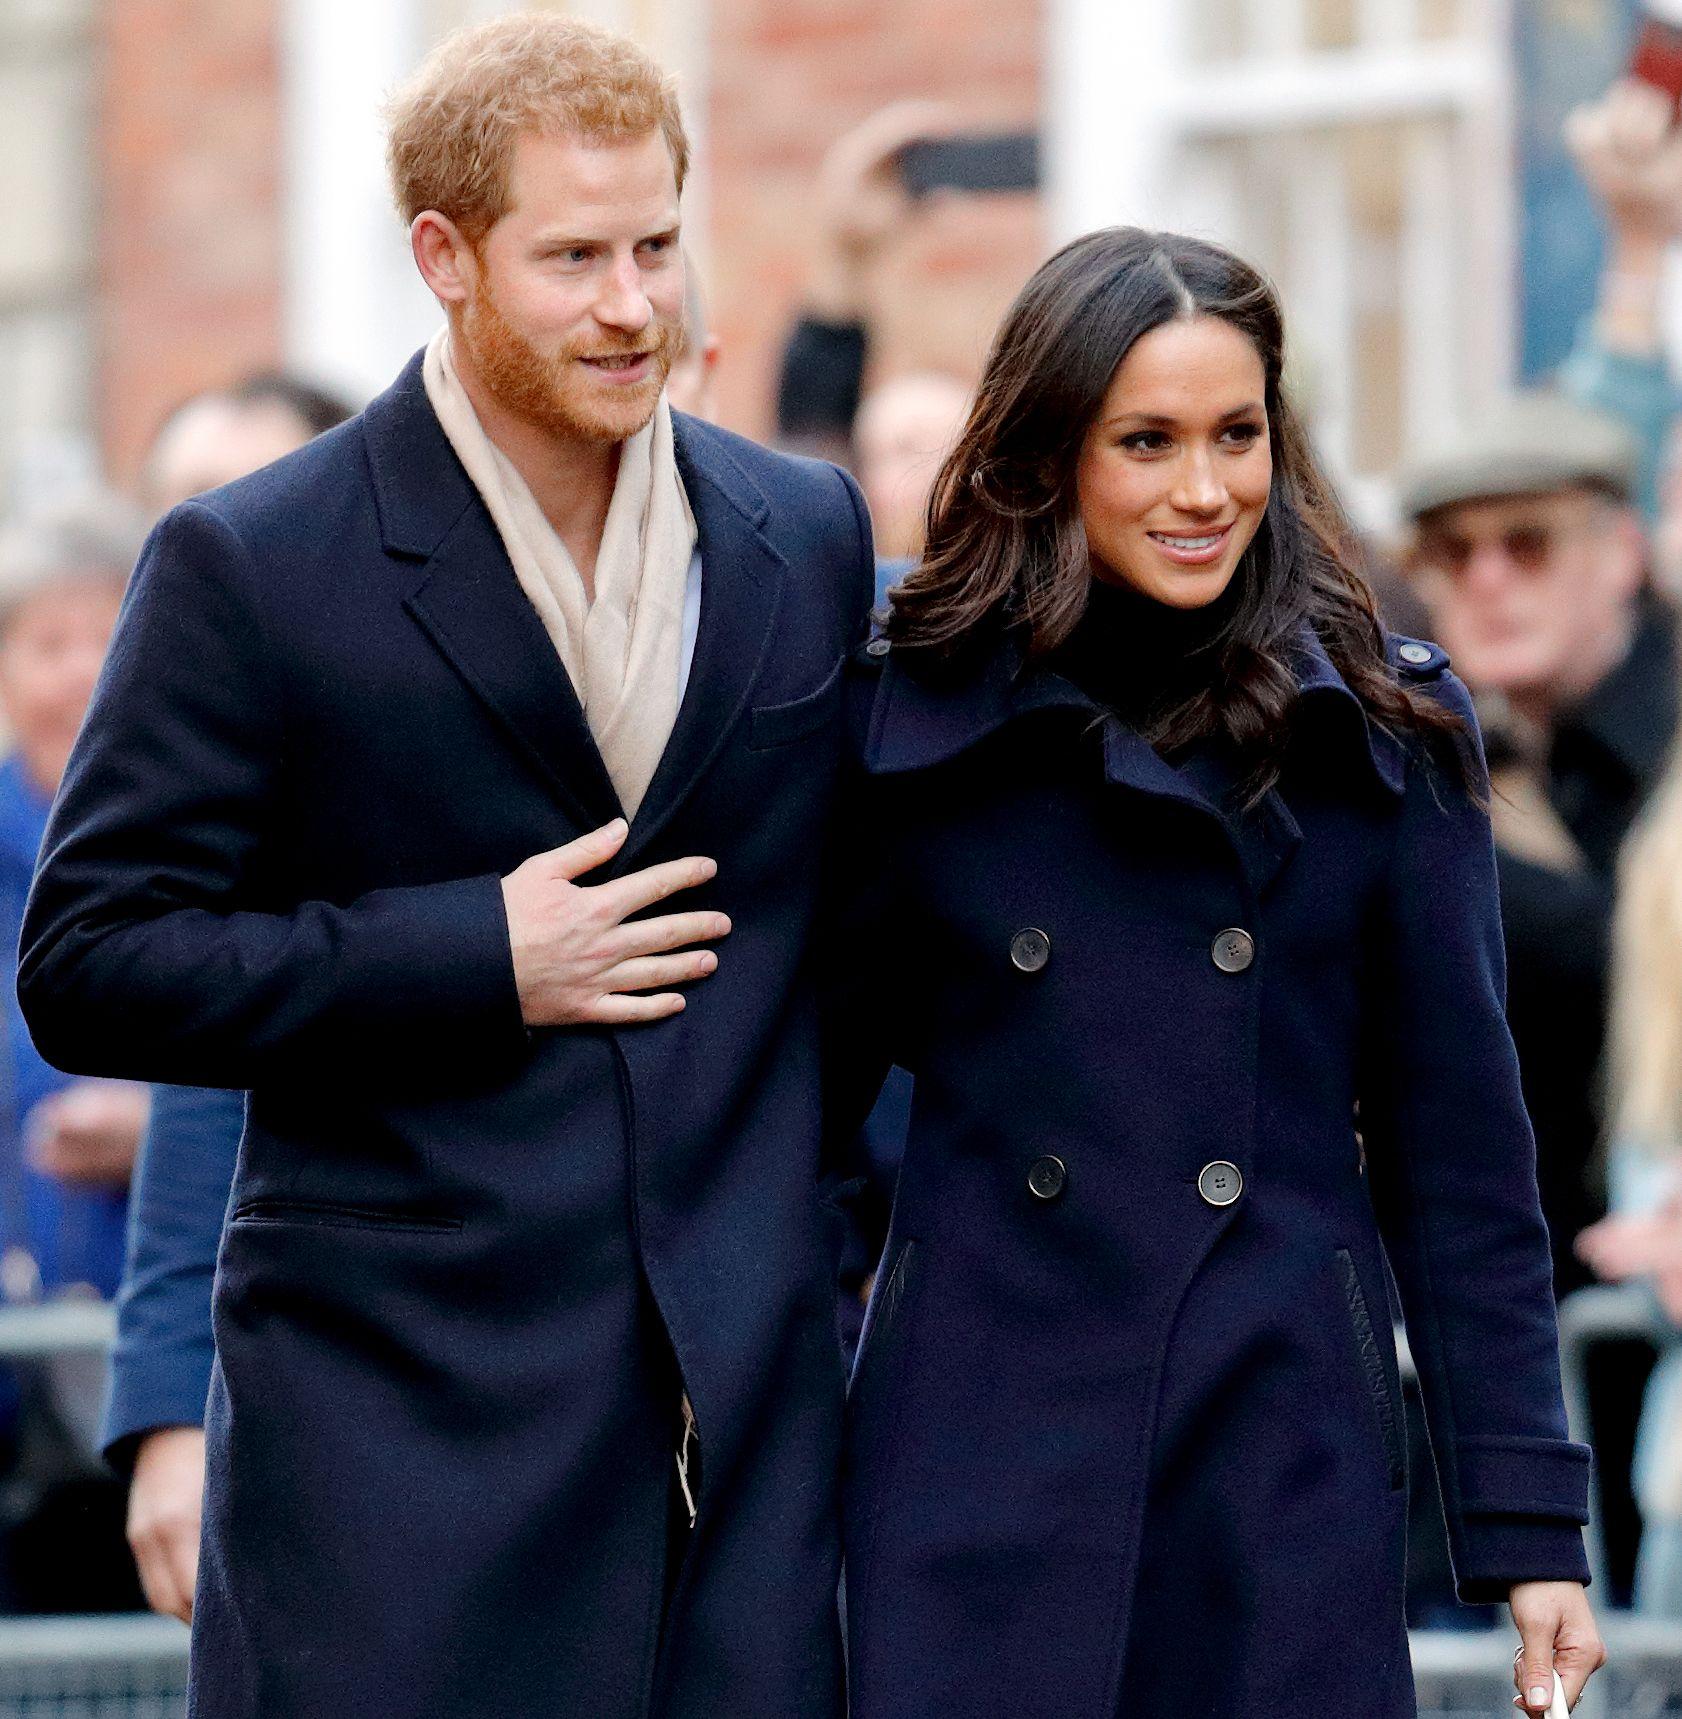 Prince Harry, Meghan Markle Plan Getaway Ahead Of Wedding